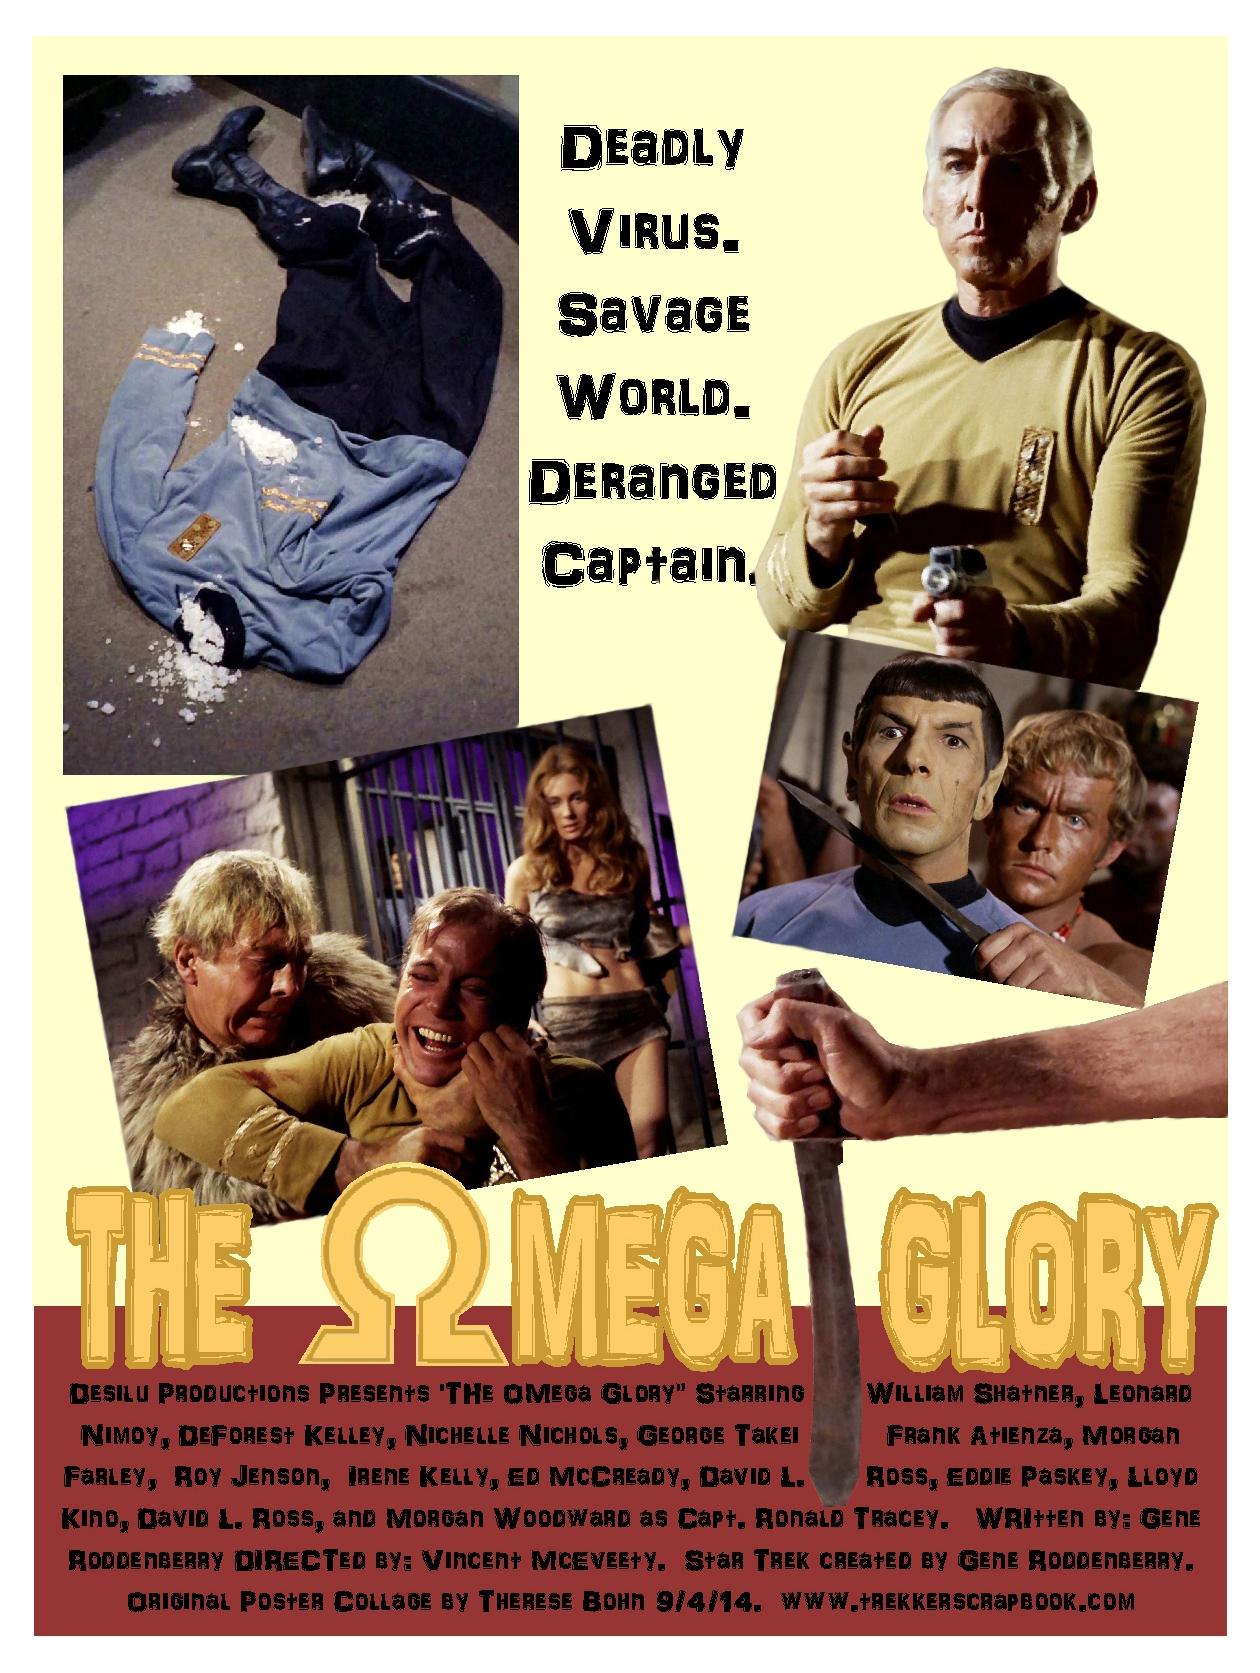 55-The Omega Glory